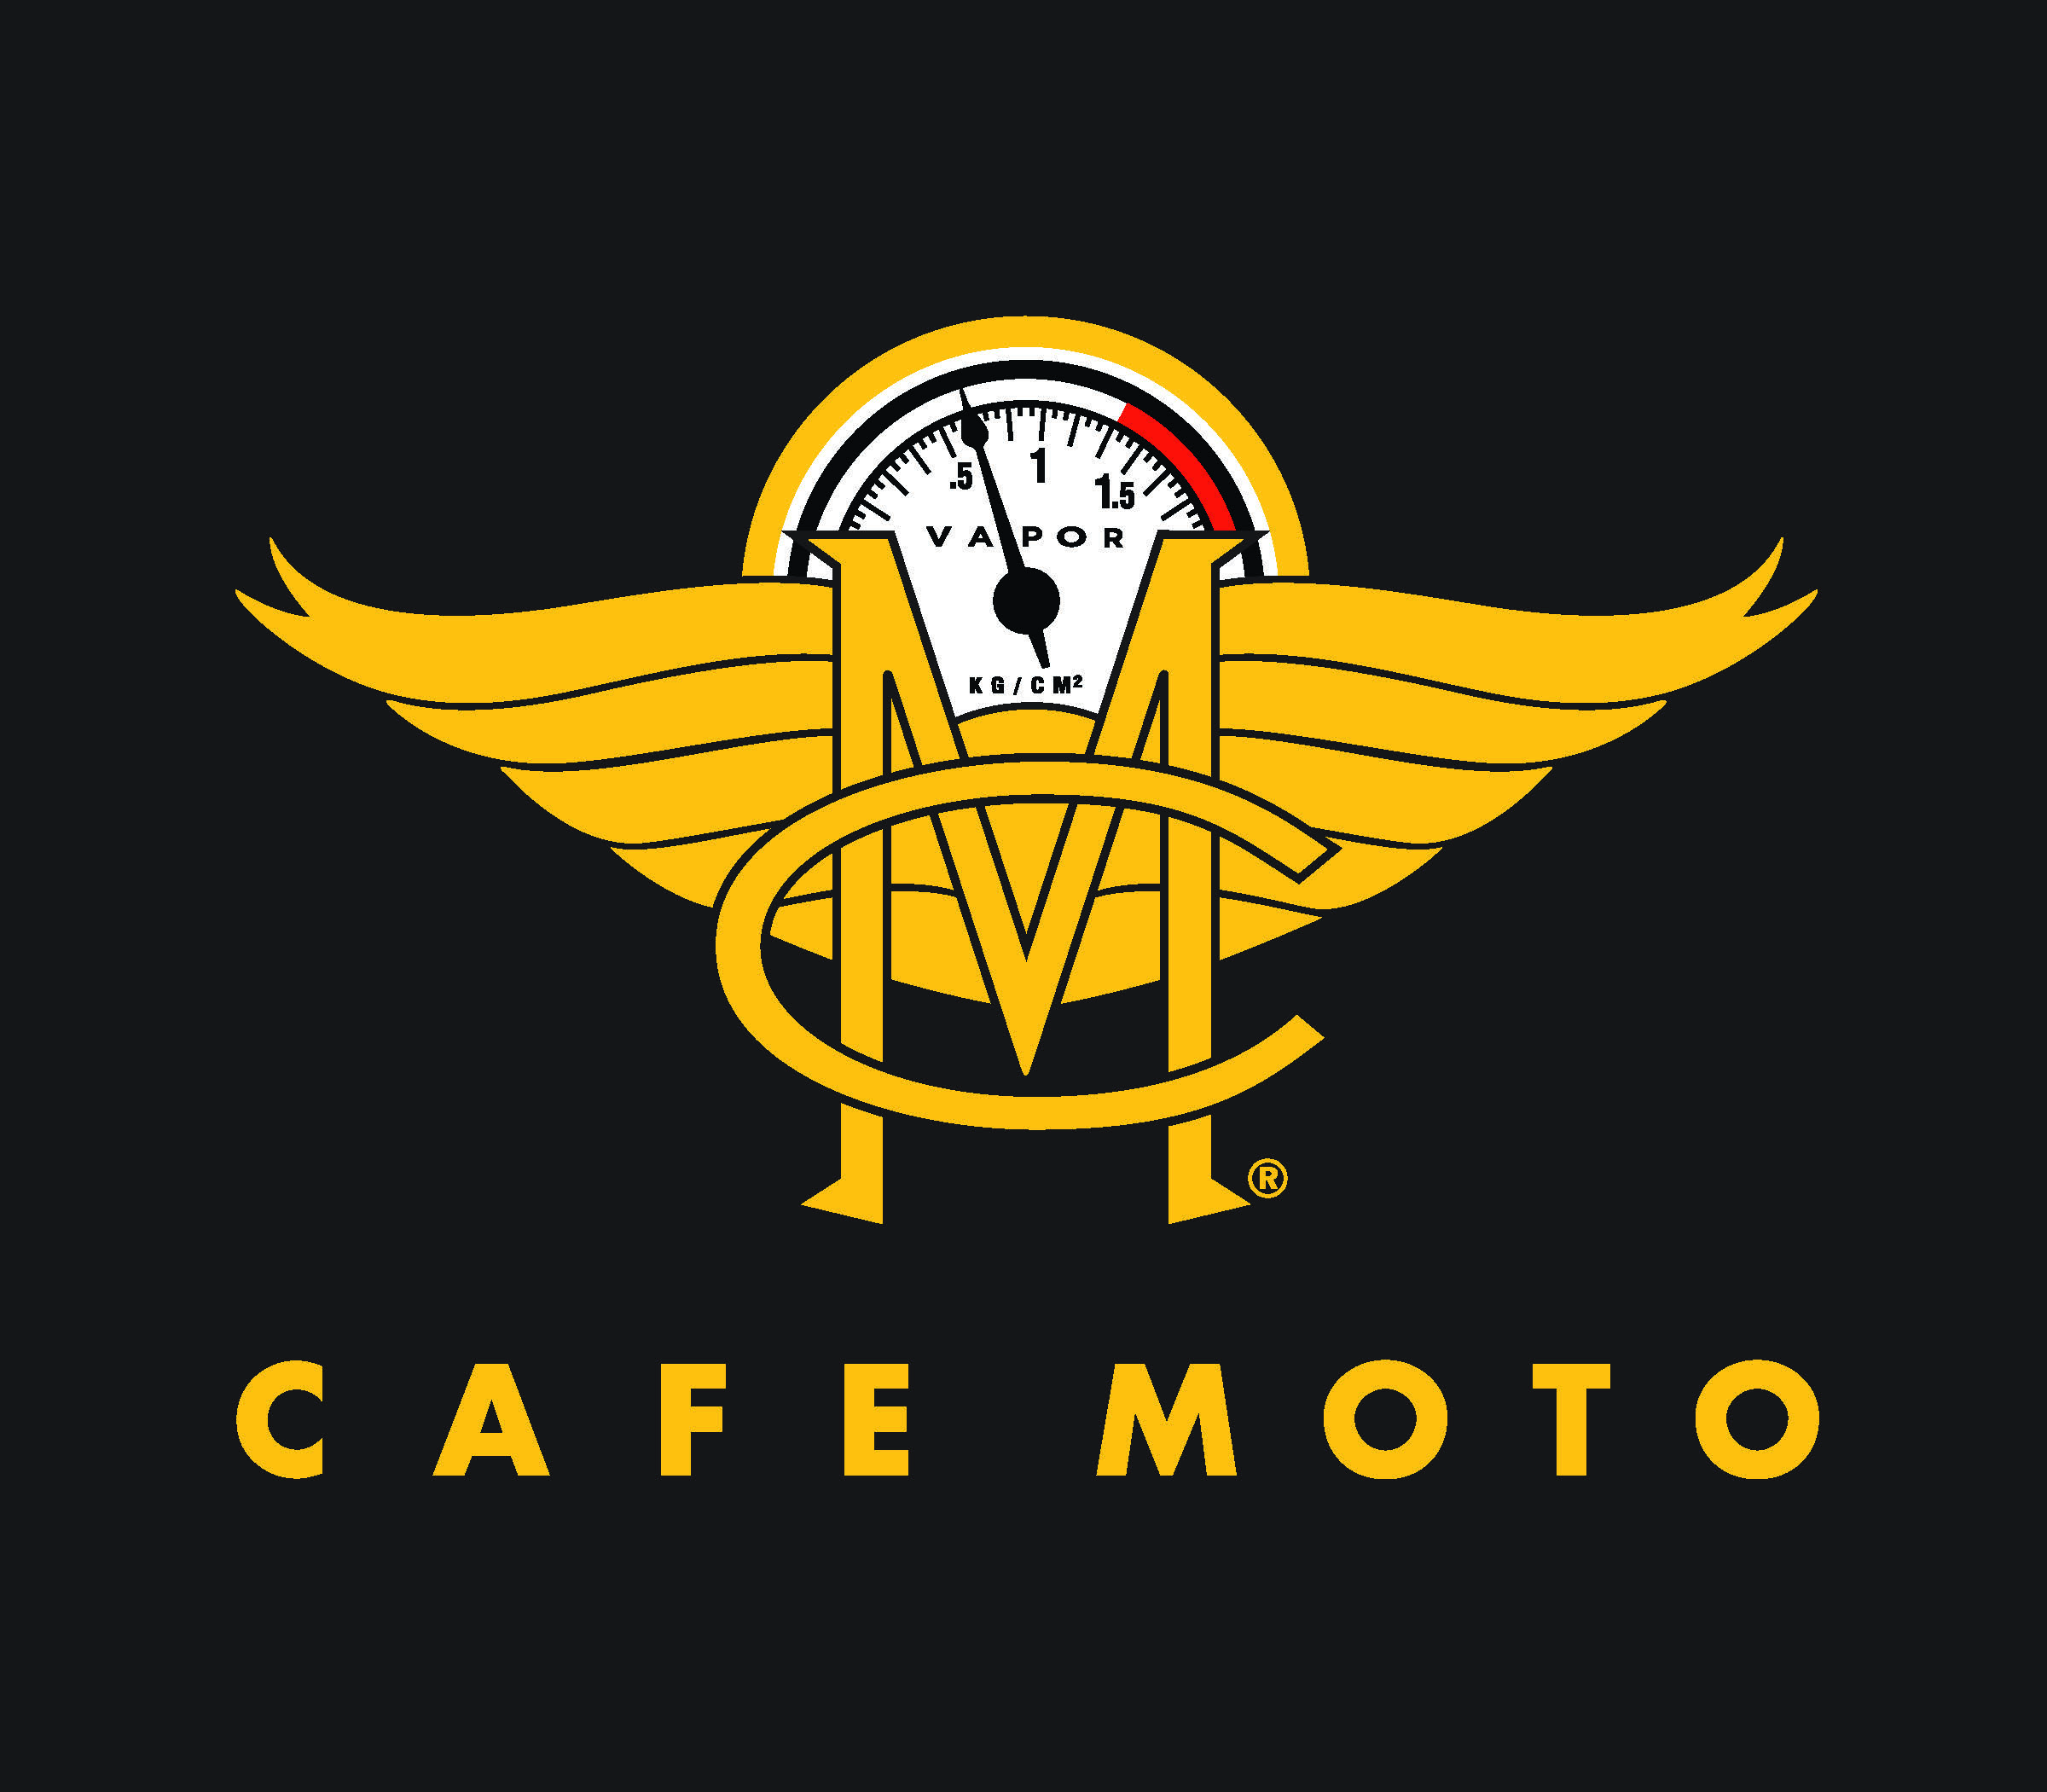 cafe_moto.jpg